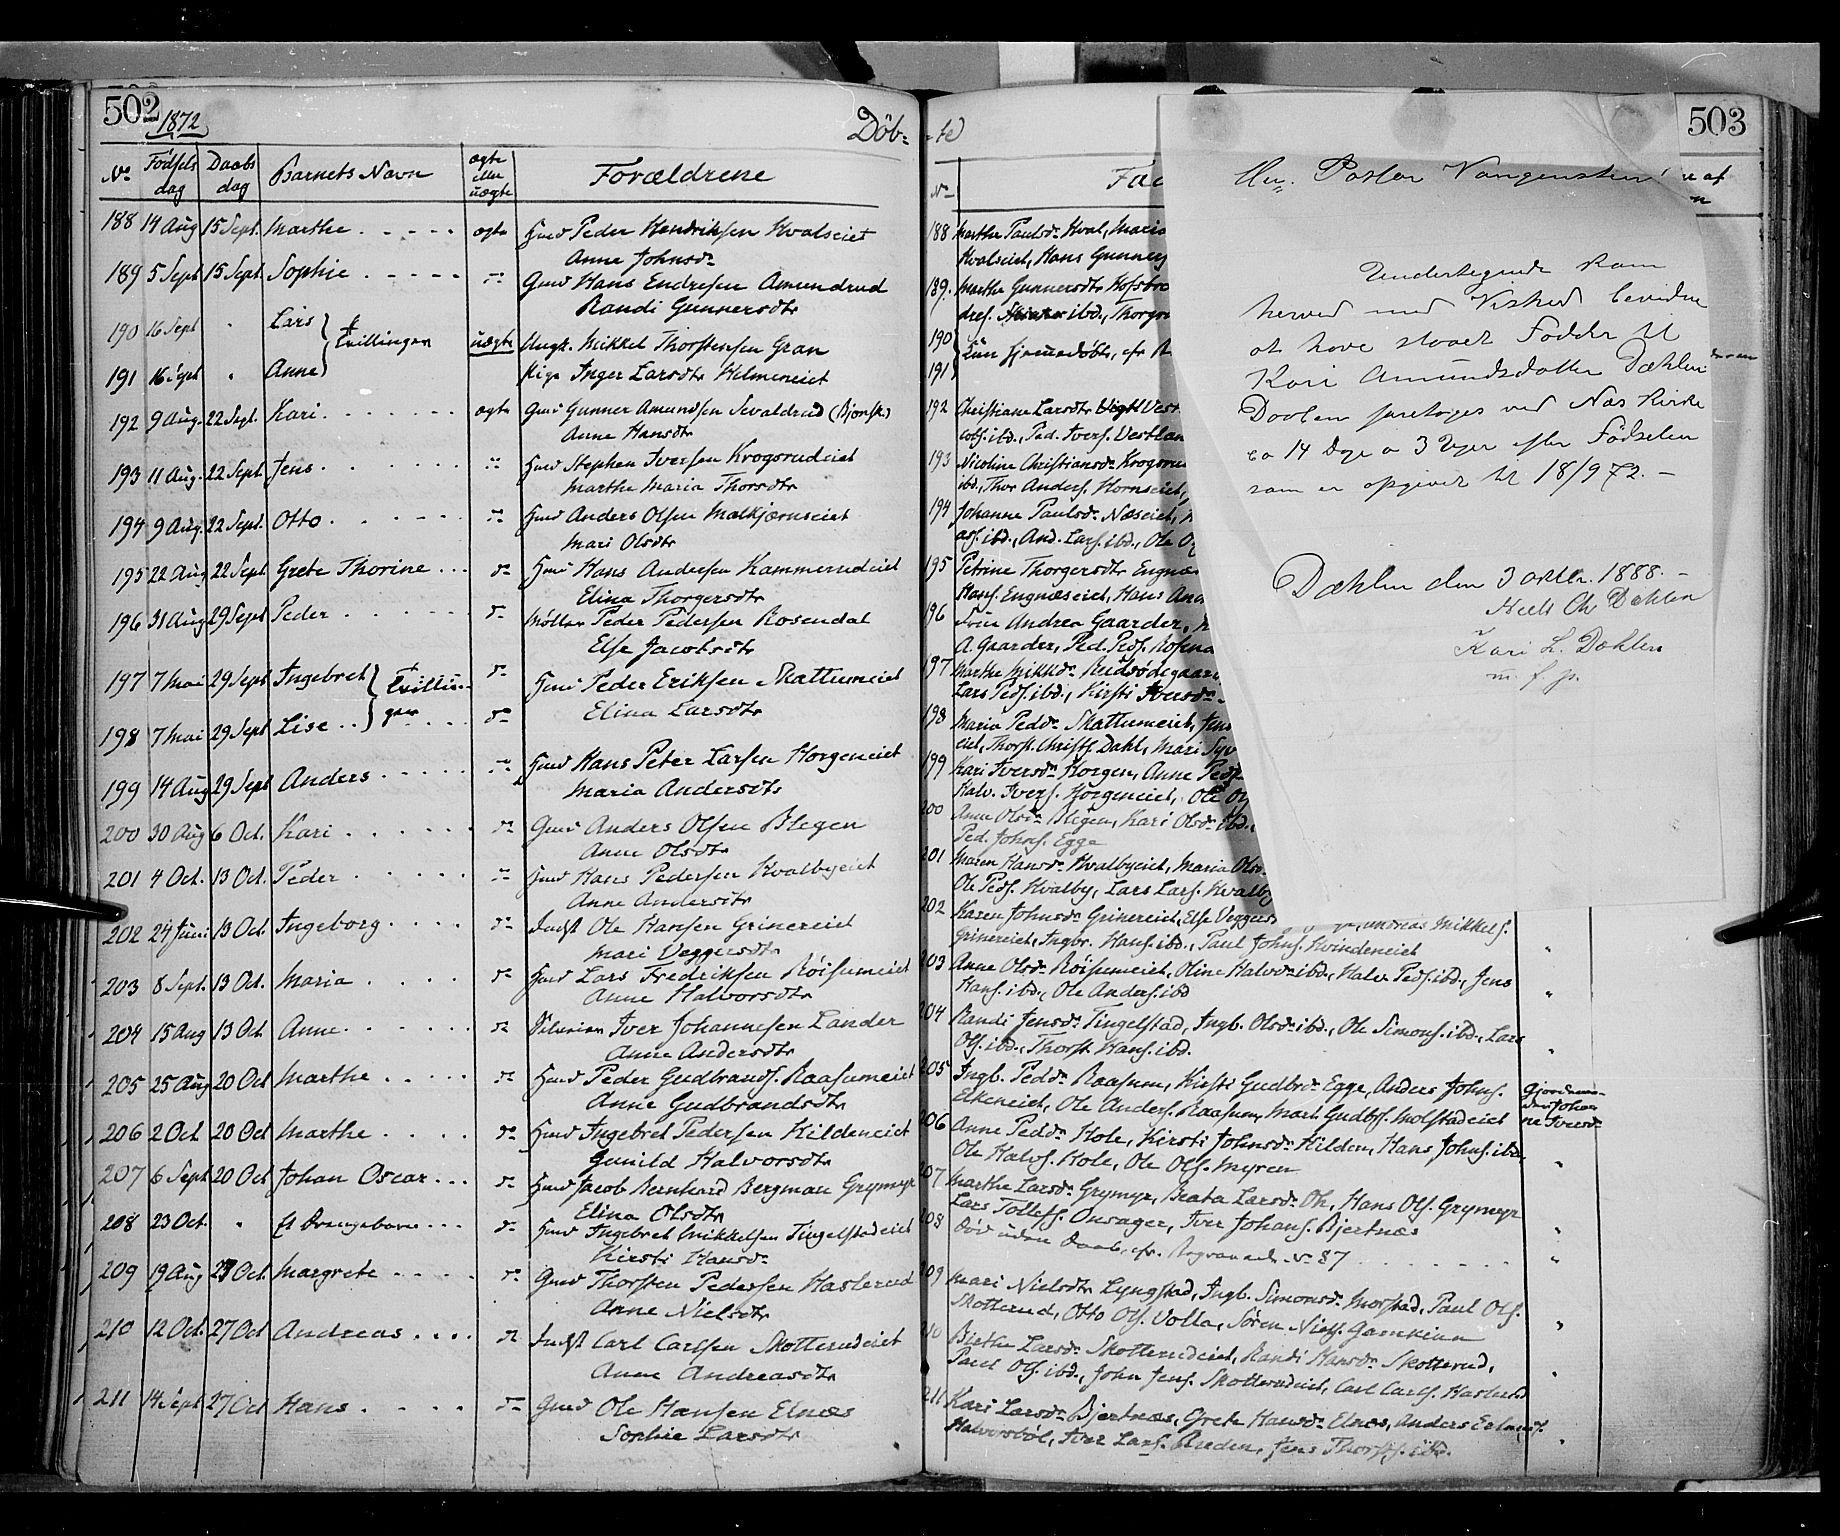 SAH, Gran prestekontor, Ministerialbok nr. 12, 1856-1874, s. 502-503